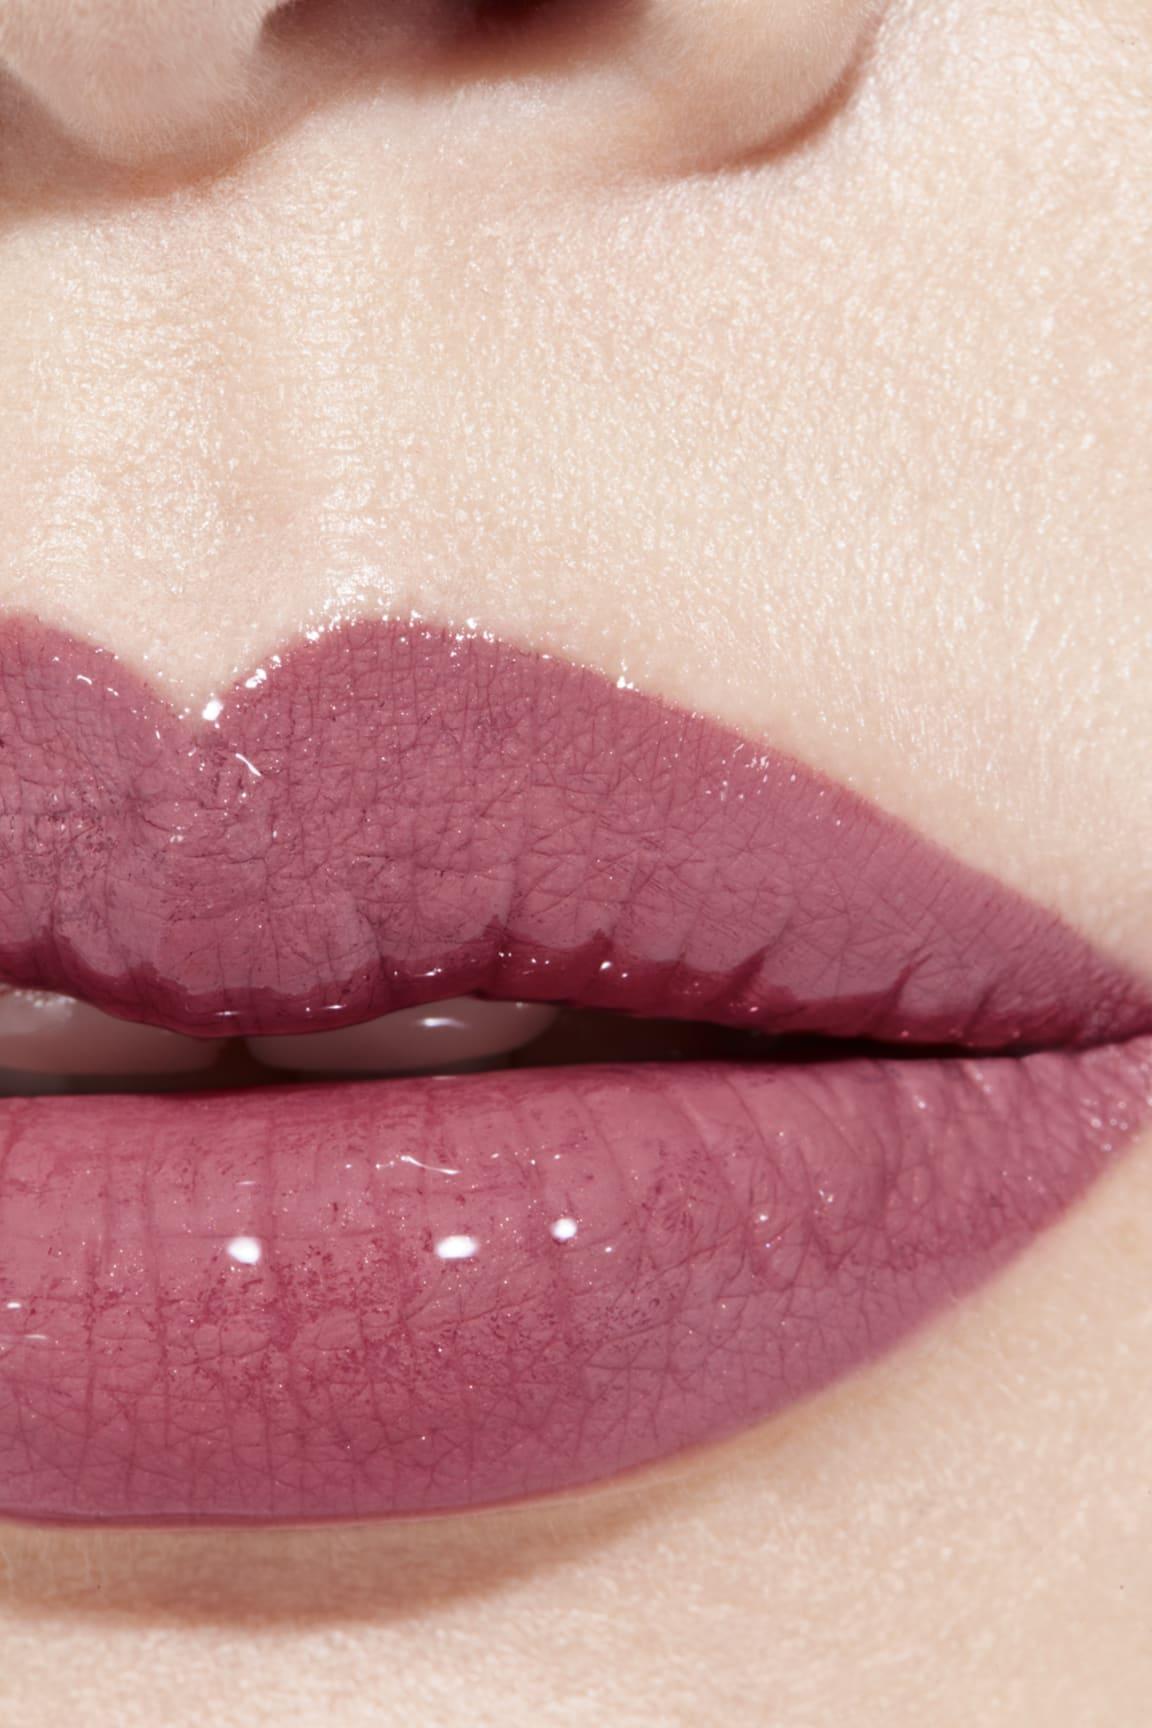 Application makeup visual 1 - LE ROUGE DUO ULTRA TENUE 172 - LIGHT MAUVE